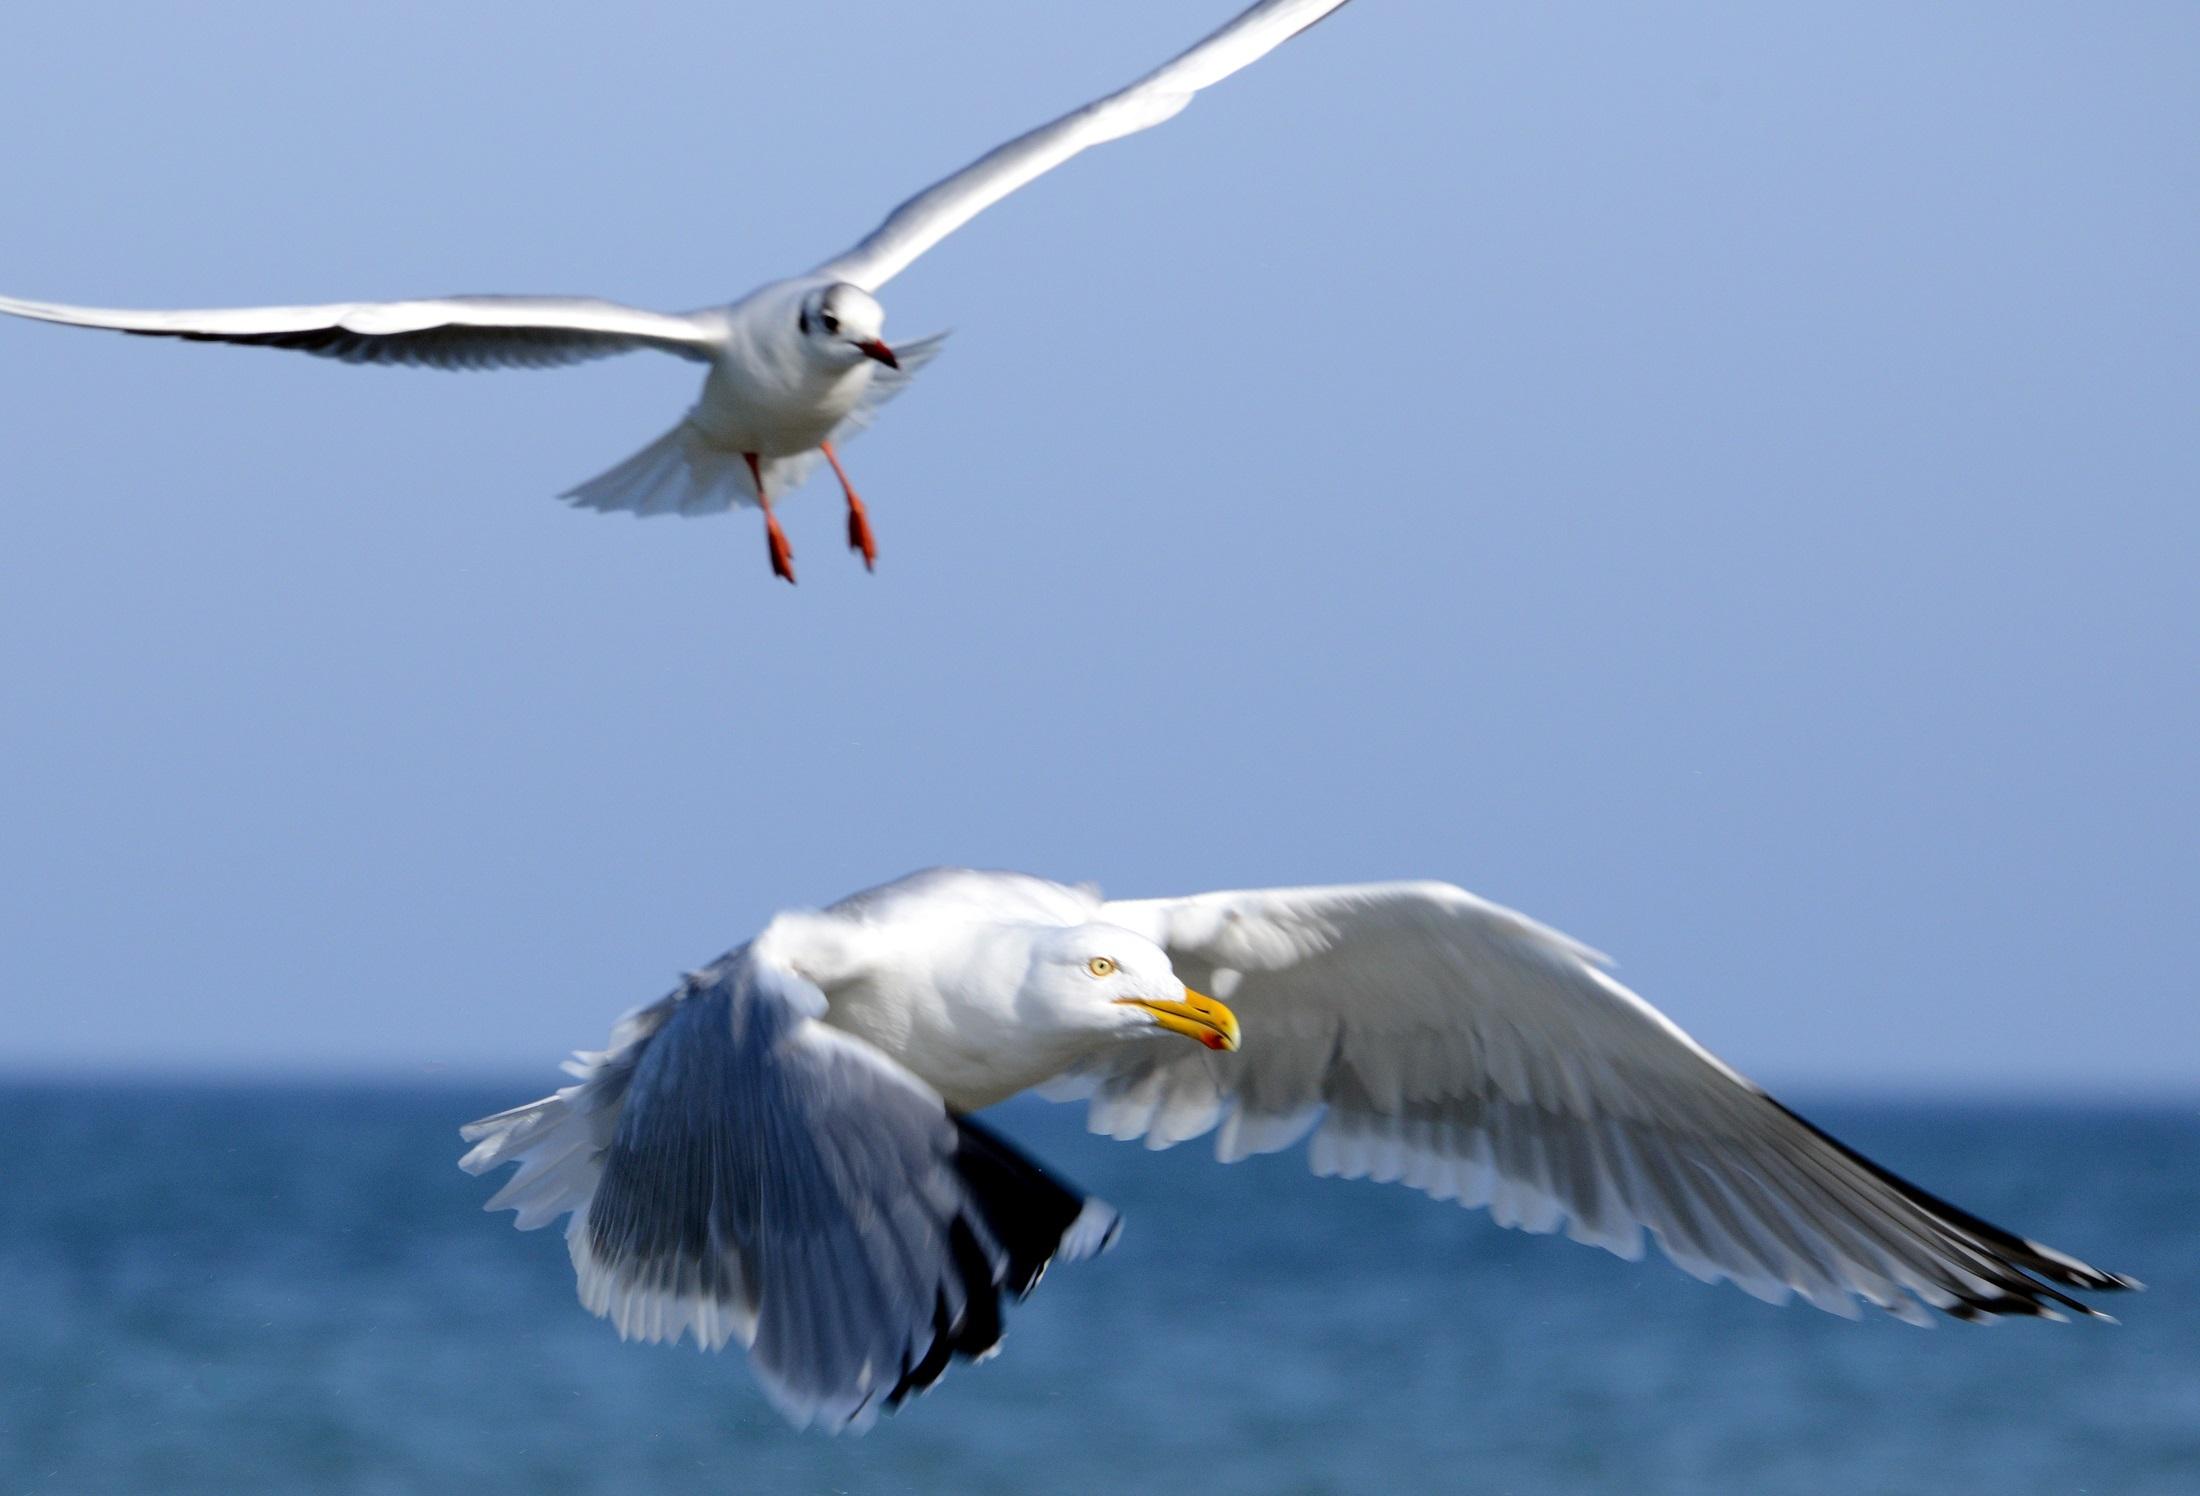 Free Images : sea, water, nature, ocean, bird, wing, sky ...